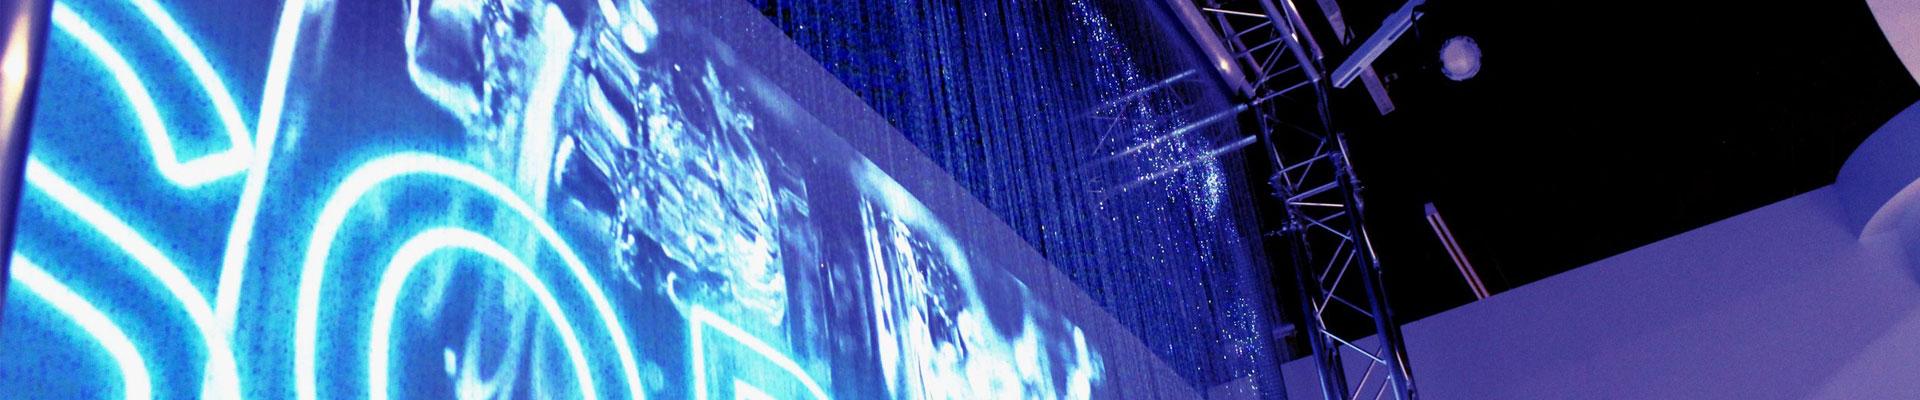 Rain Curtain For Justin Bieber Waxwork At Madame Tussauds